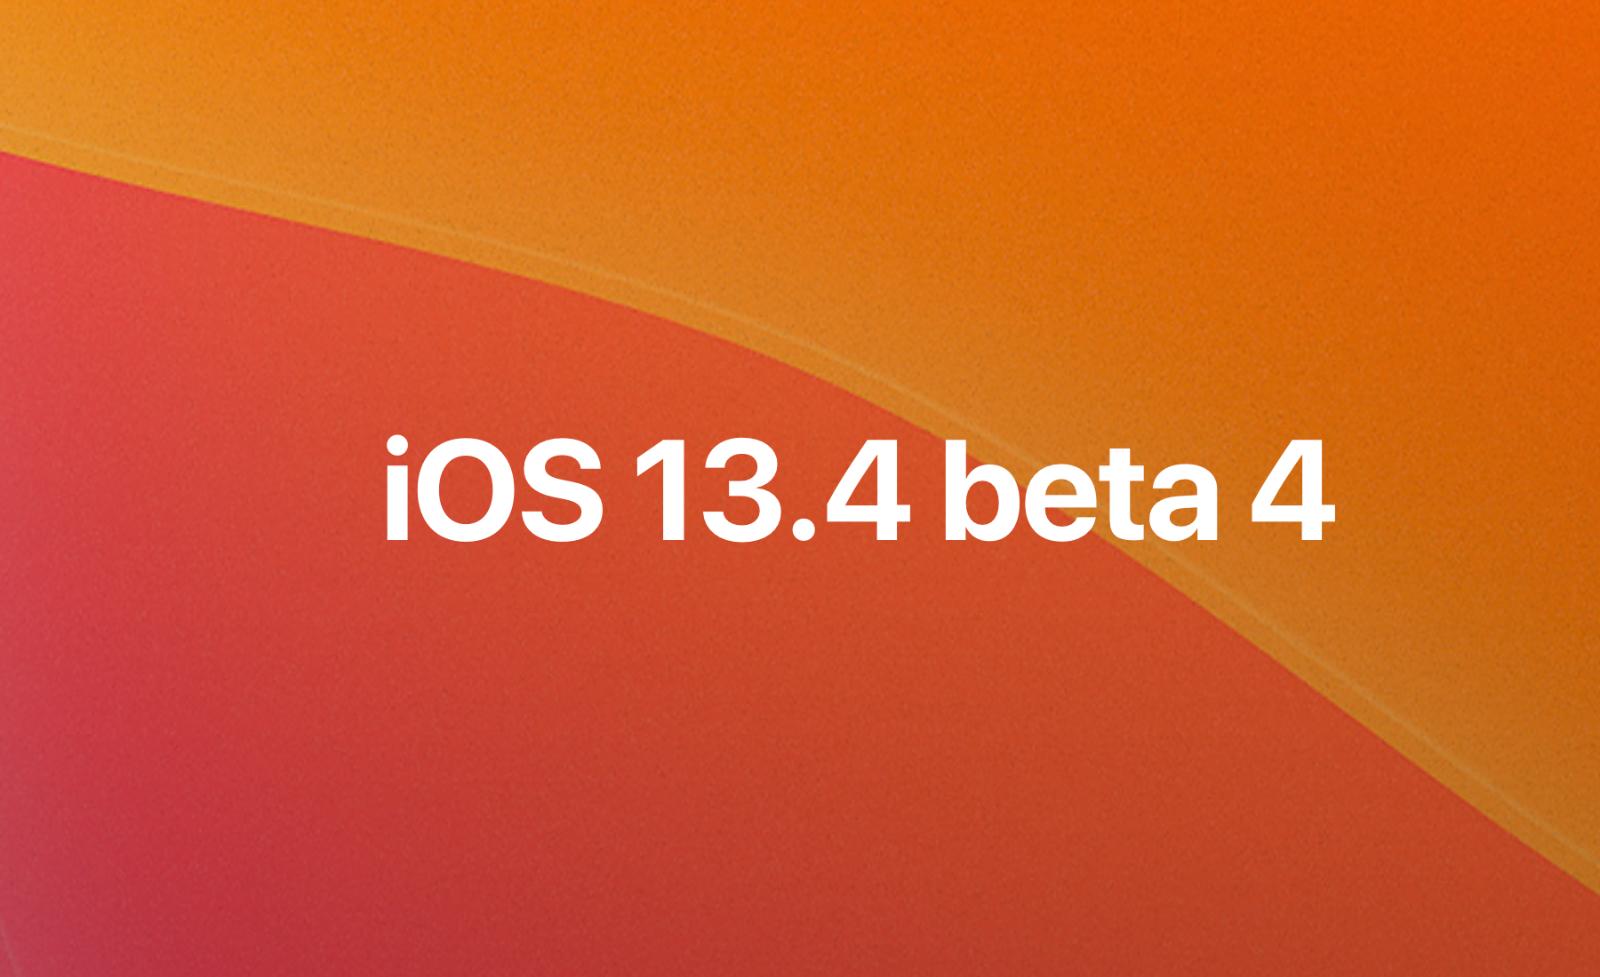 iOS 13.4 beta 4